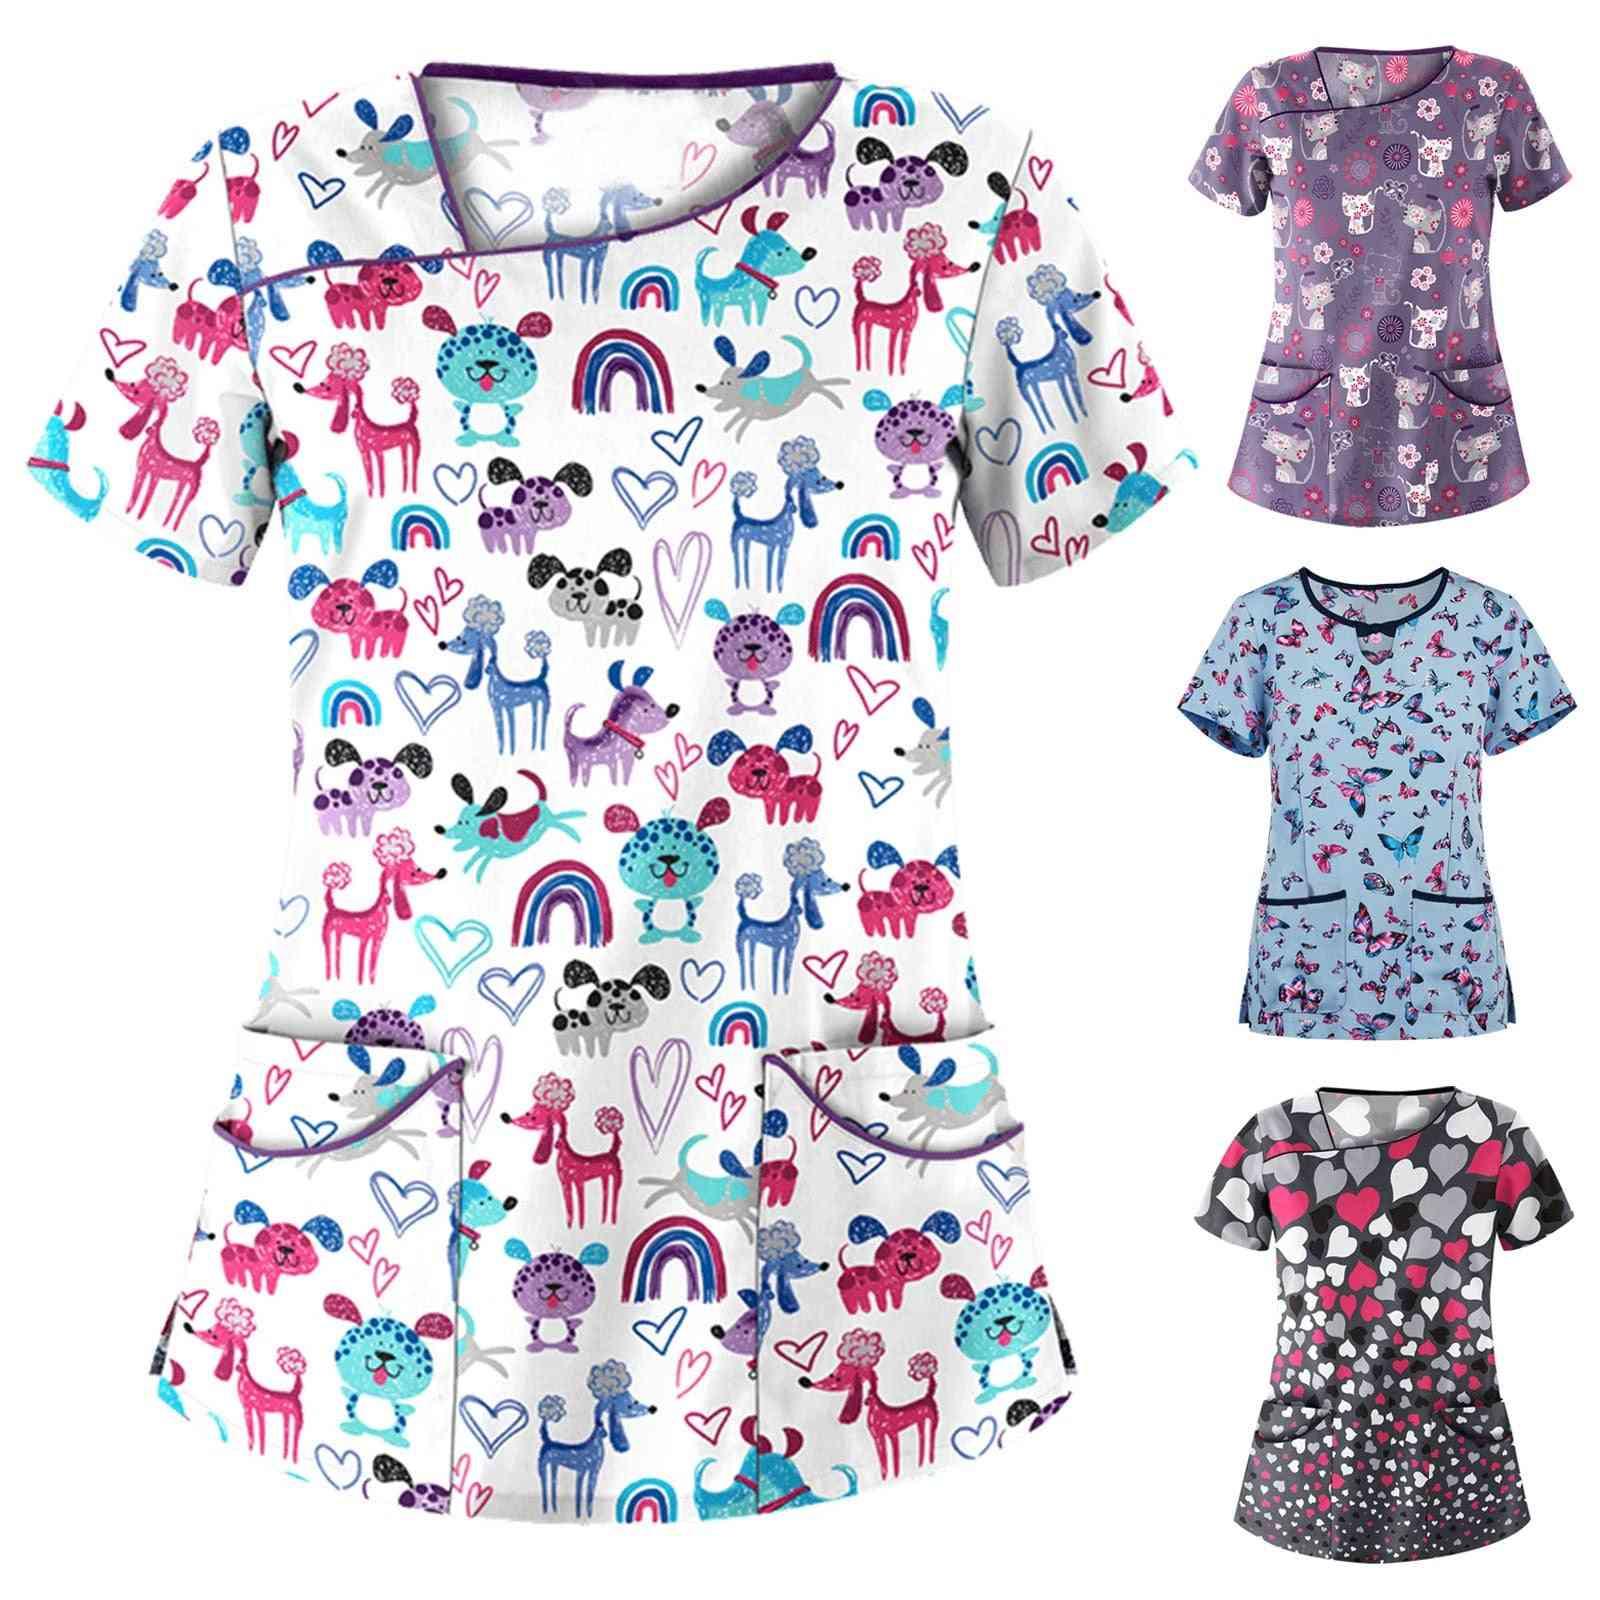 Women Cute Cartoon Print Nursing Scrubs Tops T Shirt Casual Uniforms